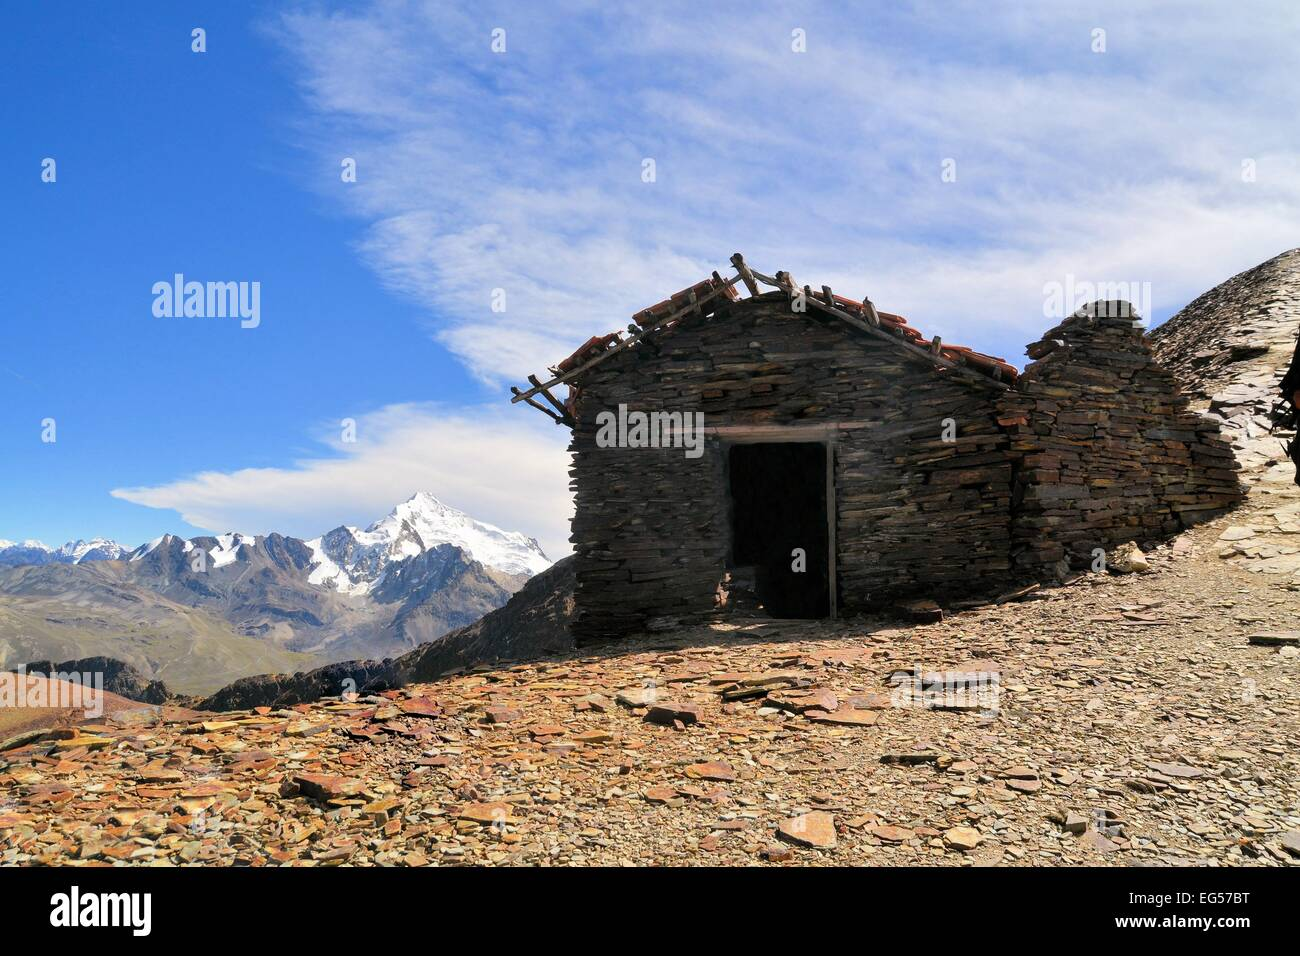 Mountain Hut on Chacaltaya peak, highest ski resort in the world, Bolivia - Stock Image